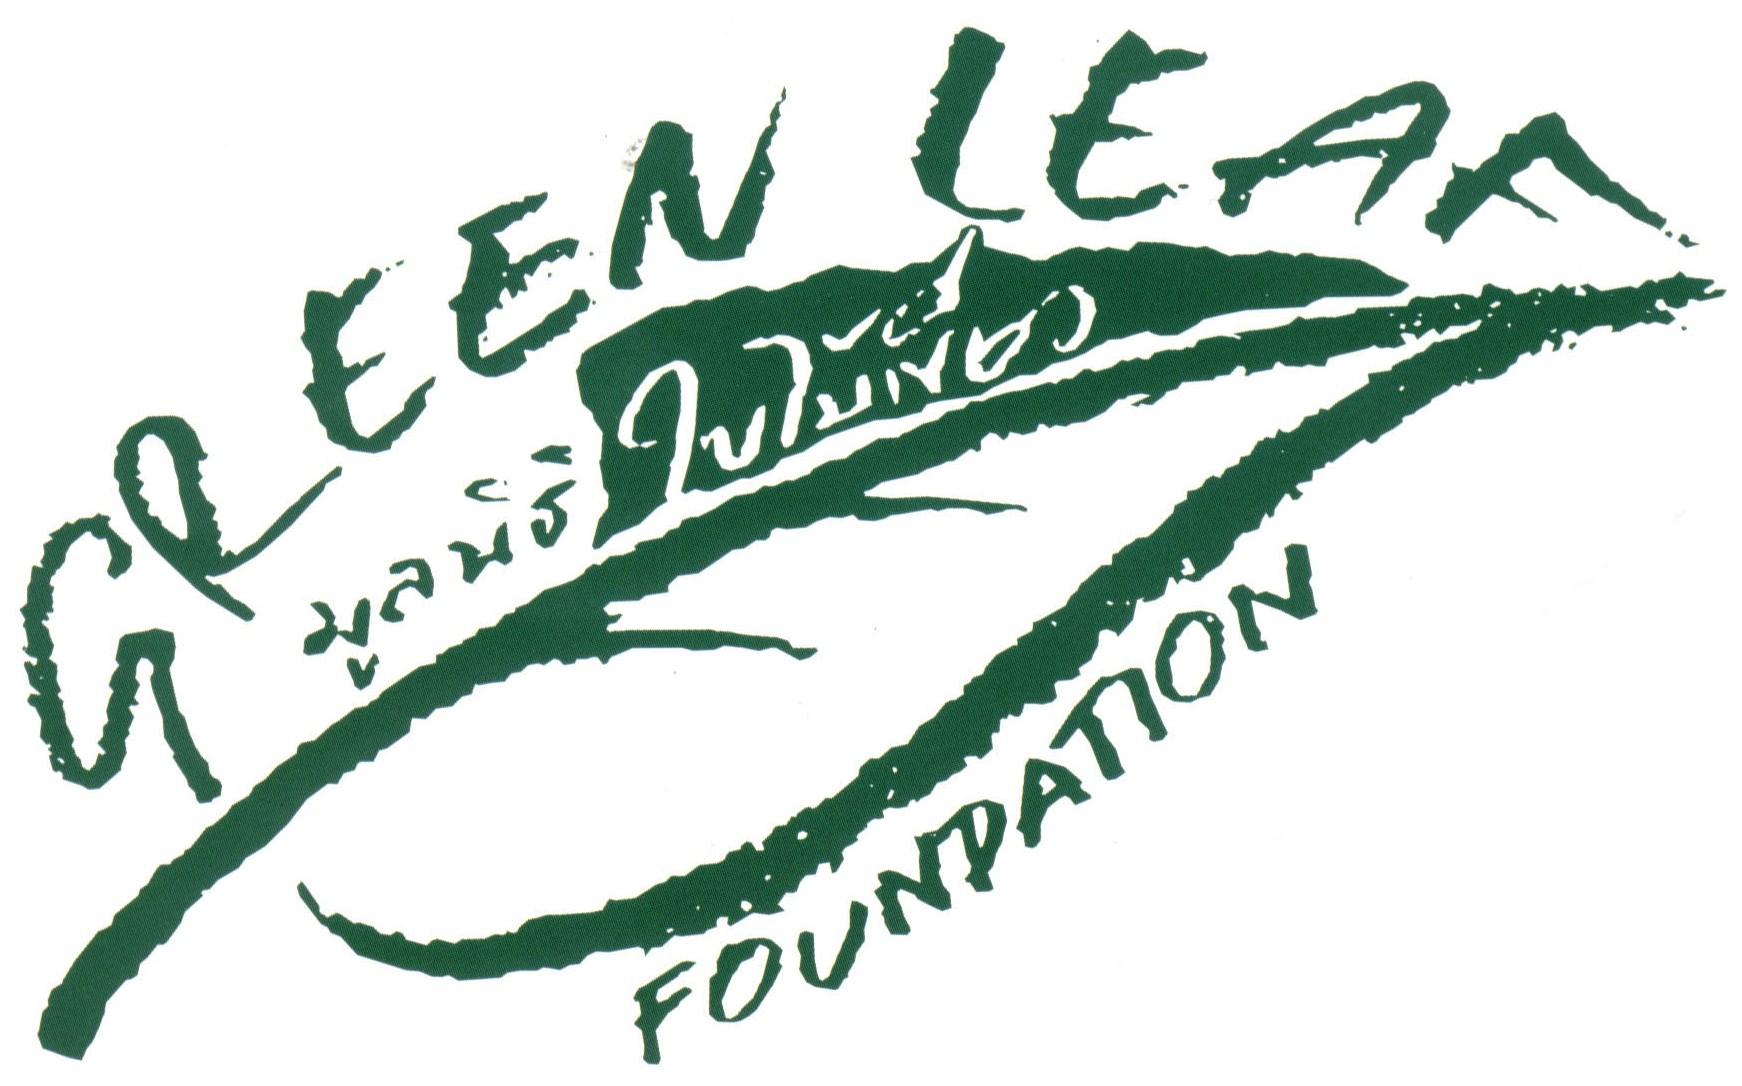 Green leaf foundation destinet 1betcityfo Choice Image